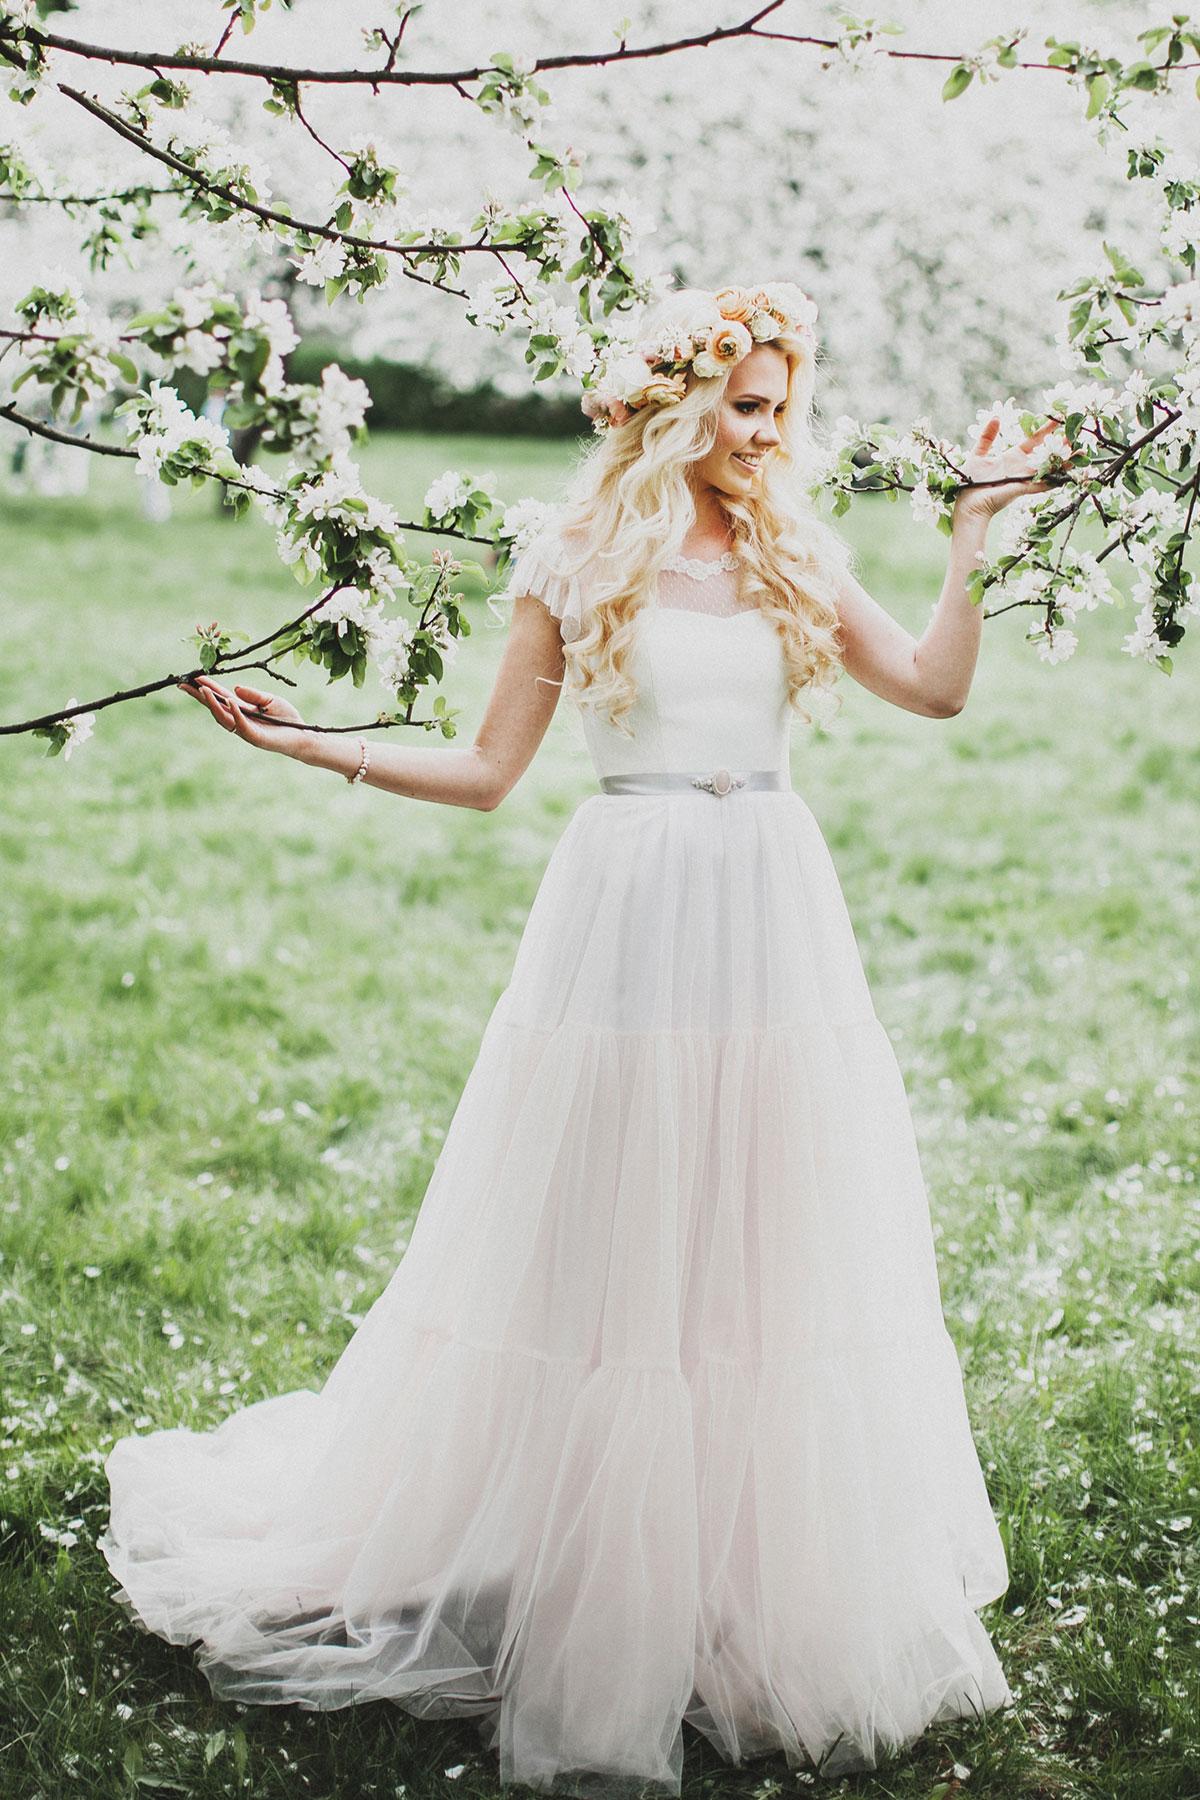 Miroslava-tulle-wedding-dress-with-corset-by-Milamira-Bridal-6.jpg